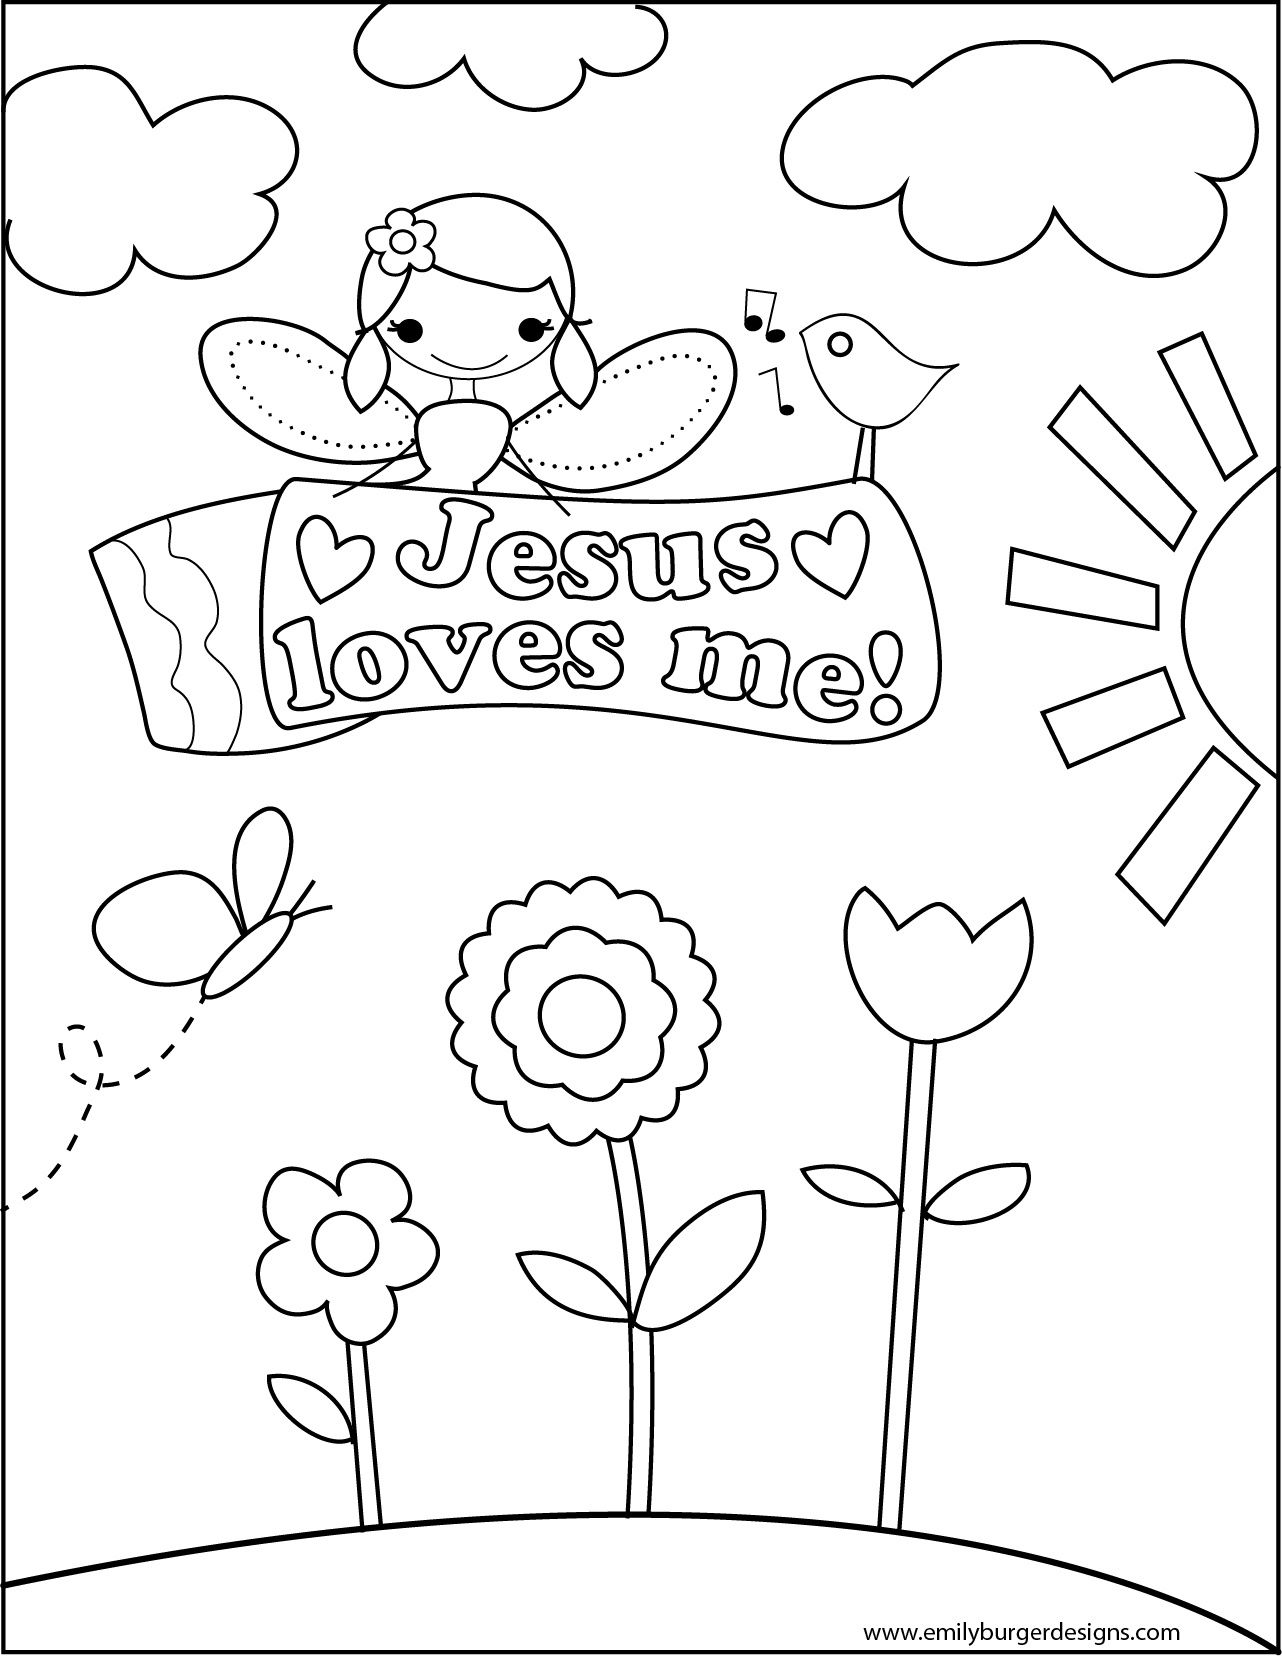 coloring_sheet_jesus_loves_me_girl  love coloring